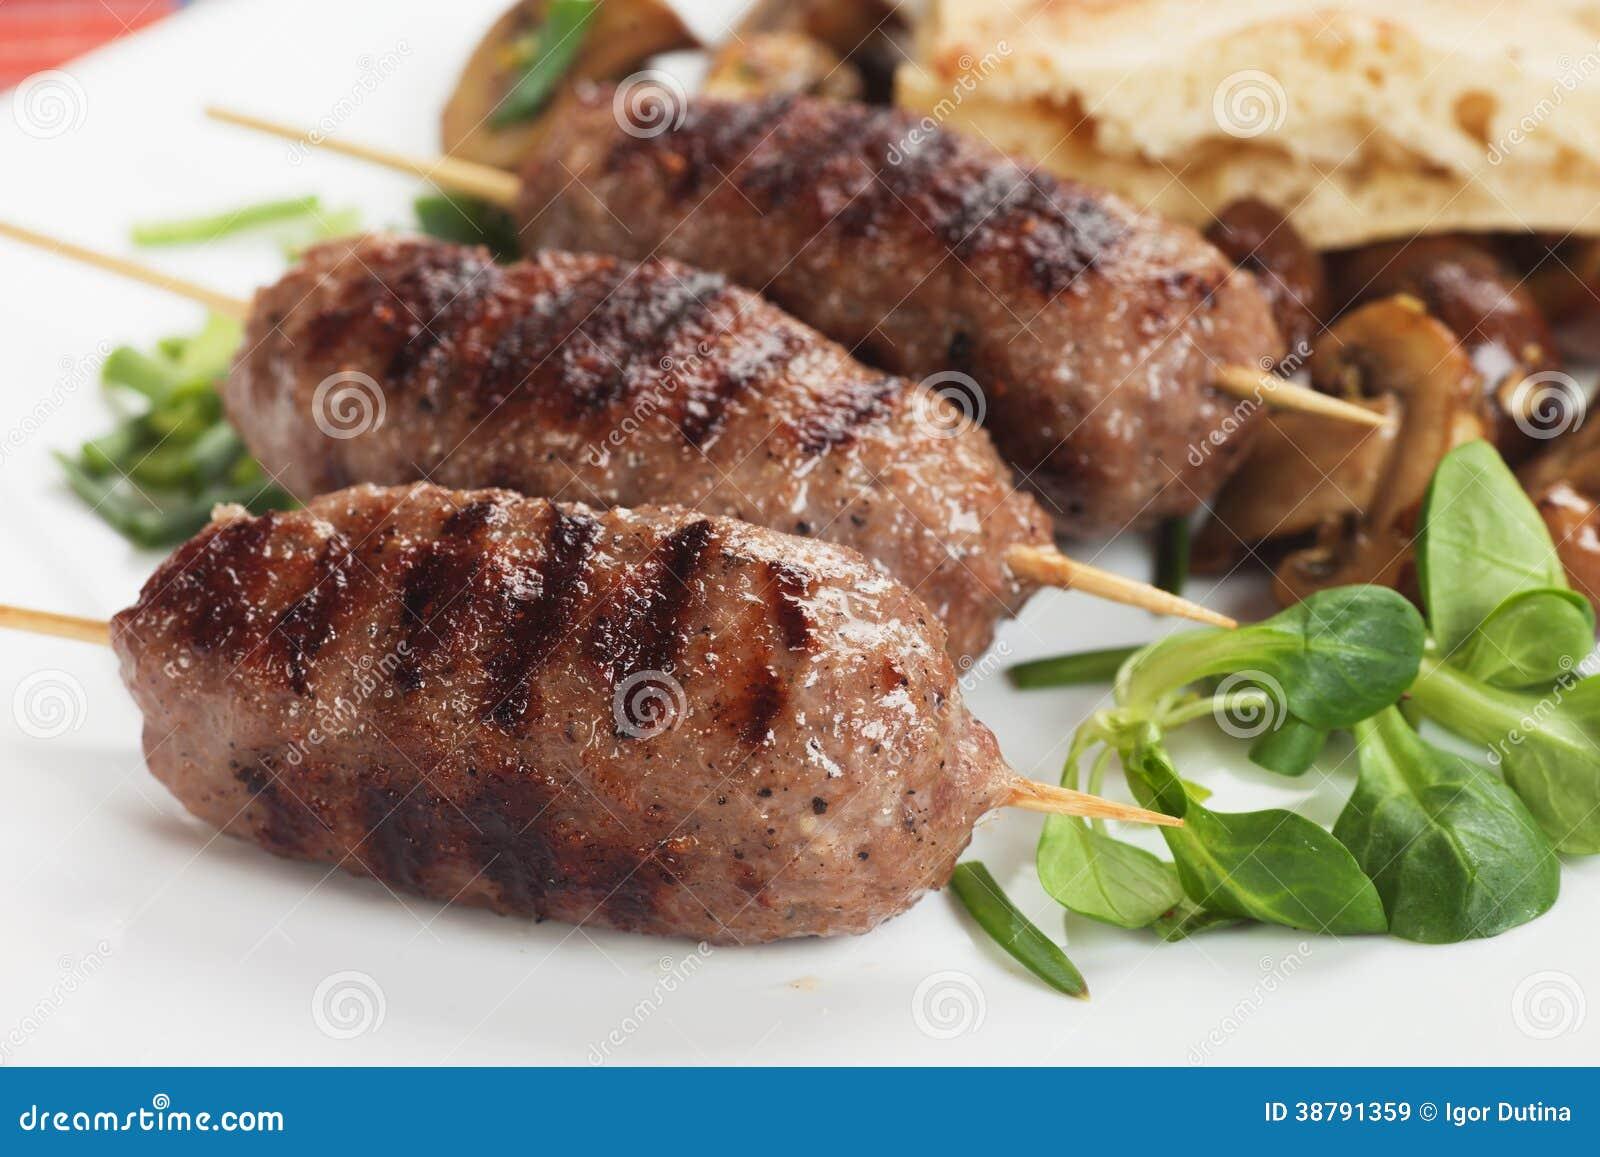 Chiche kebab brochette de viande hach e photo stock - Grill vertical pour kebab et brochettes ...